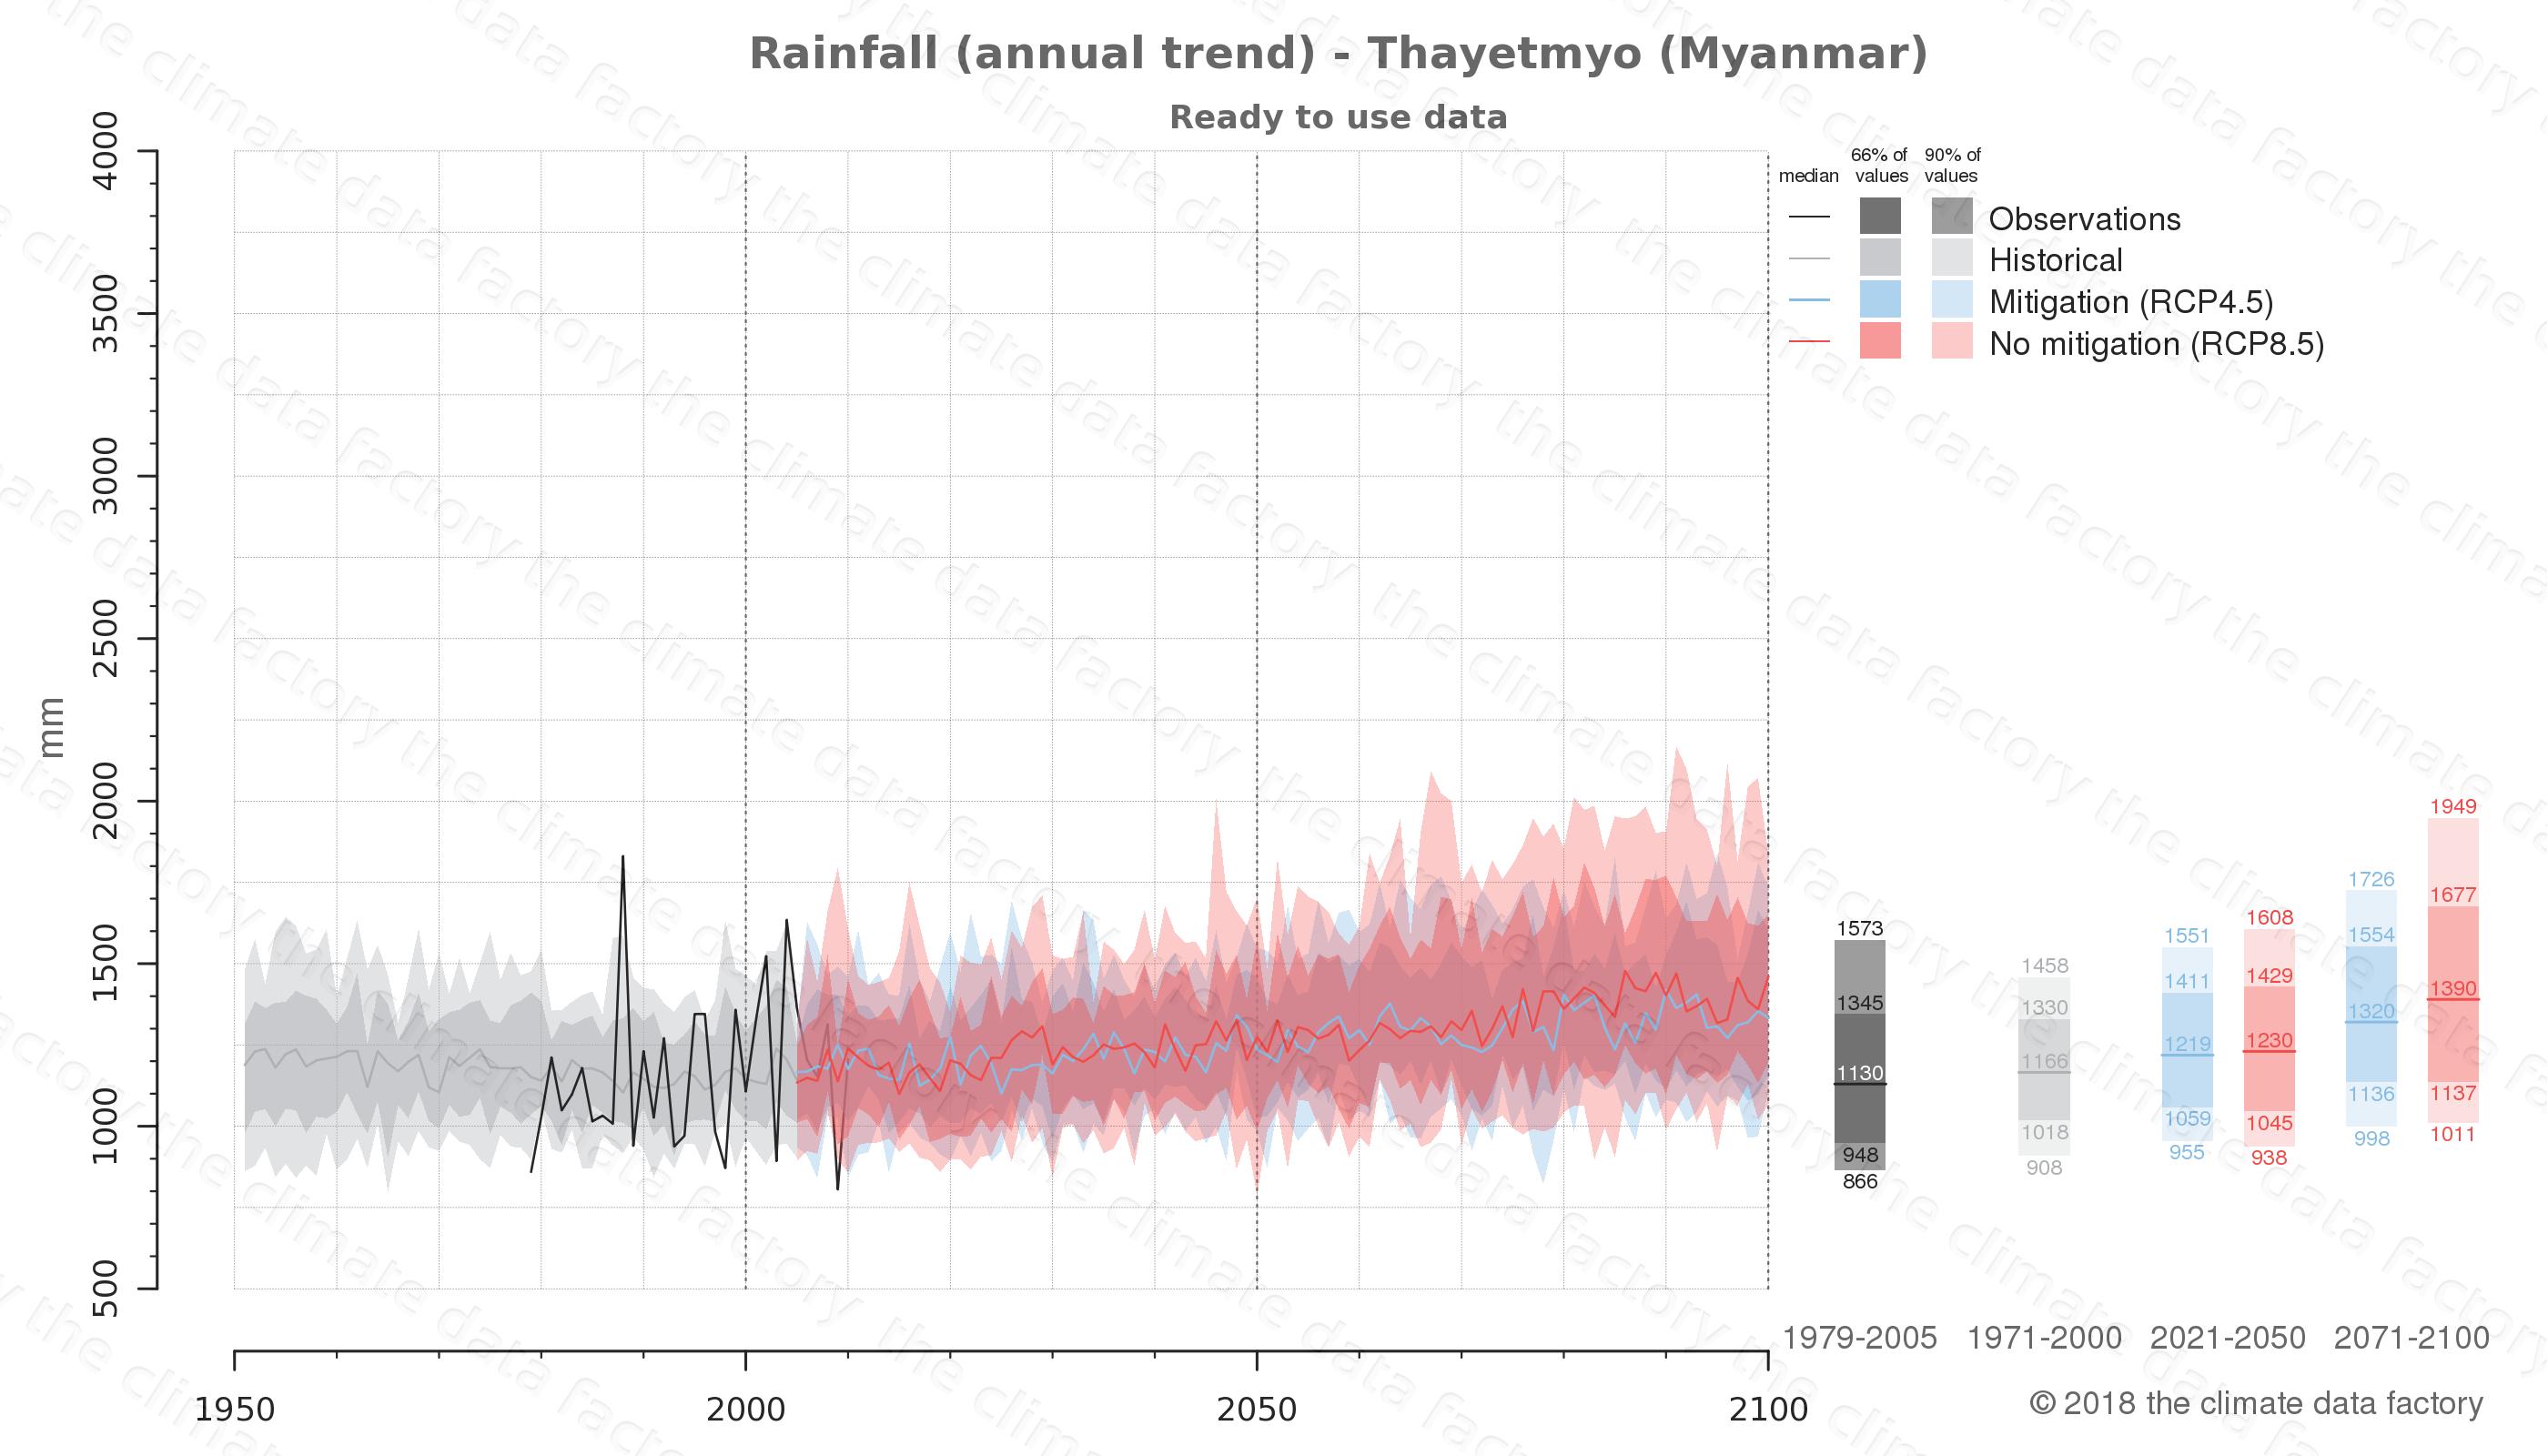 climate change data policy adaptation climate graph city data rainfall thayetmyo myanmar